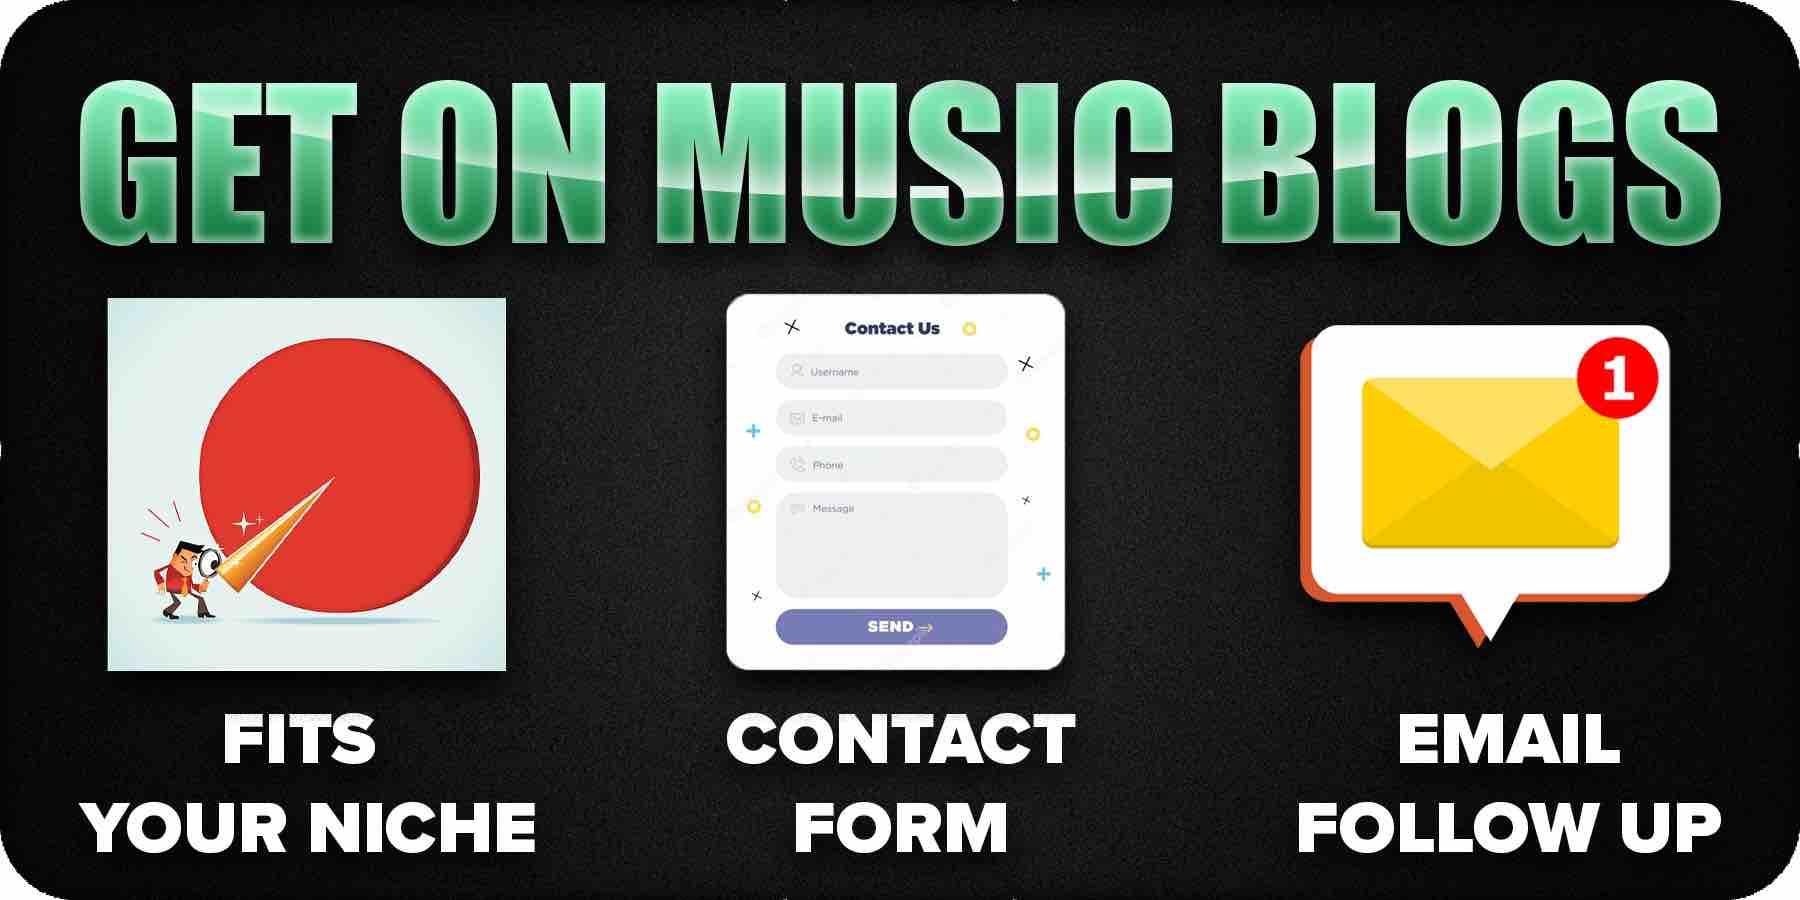 Get on music blogs